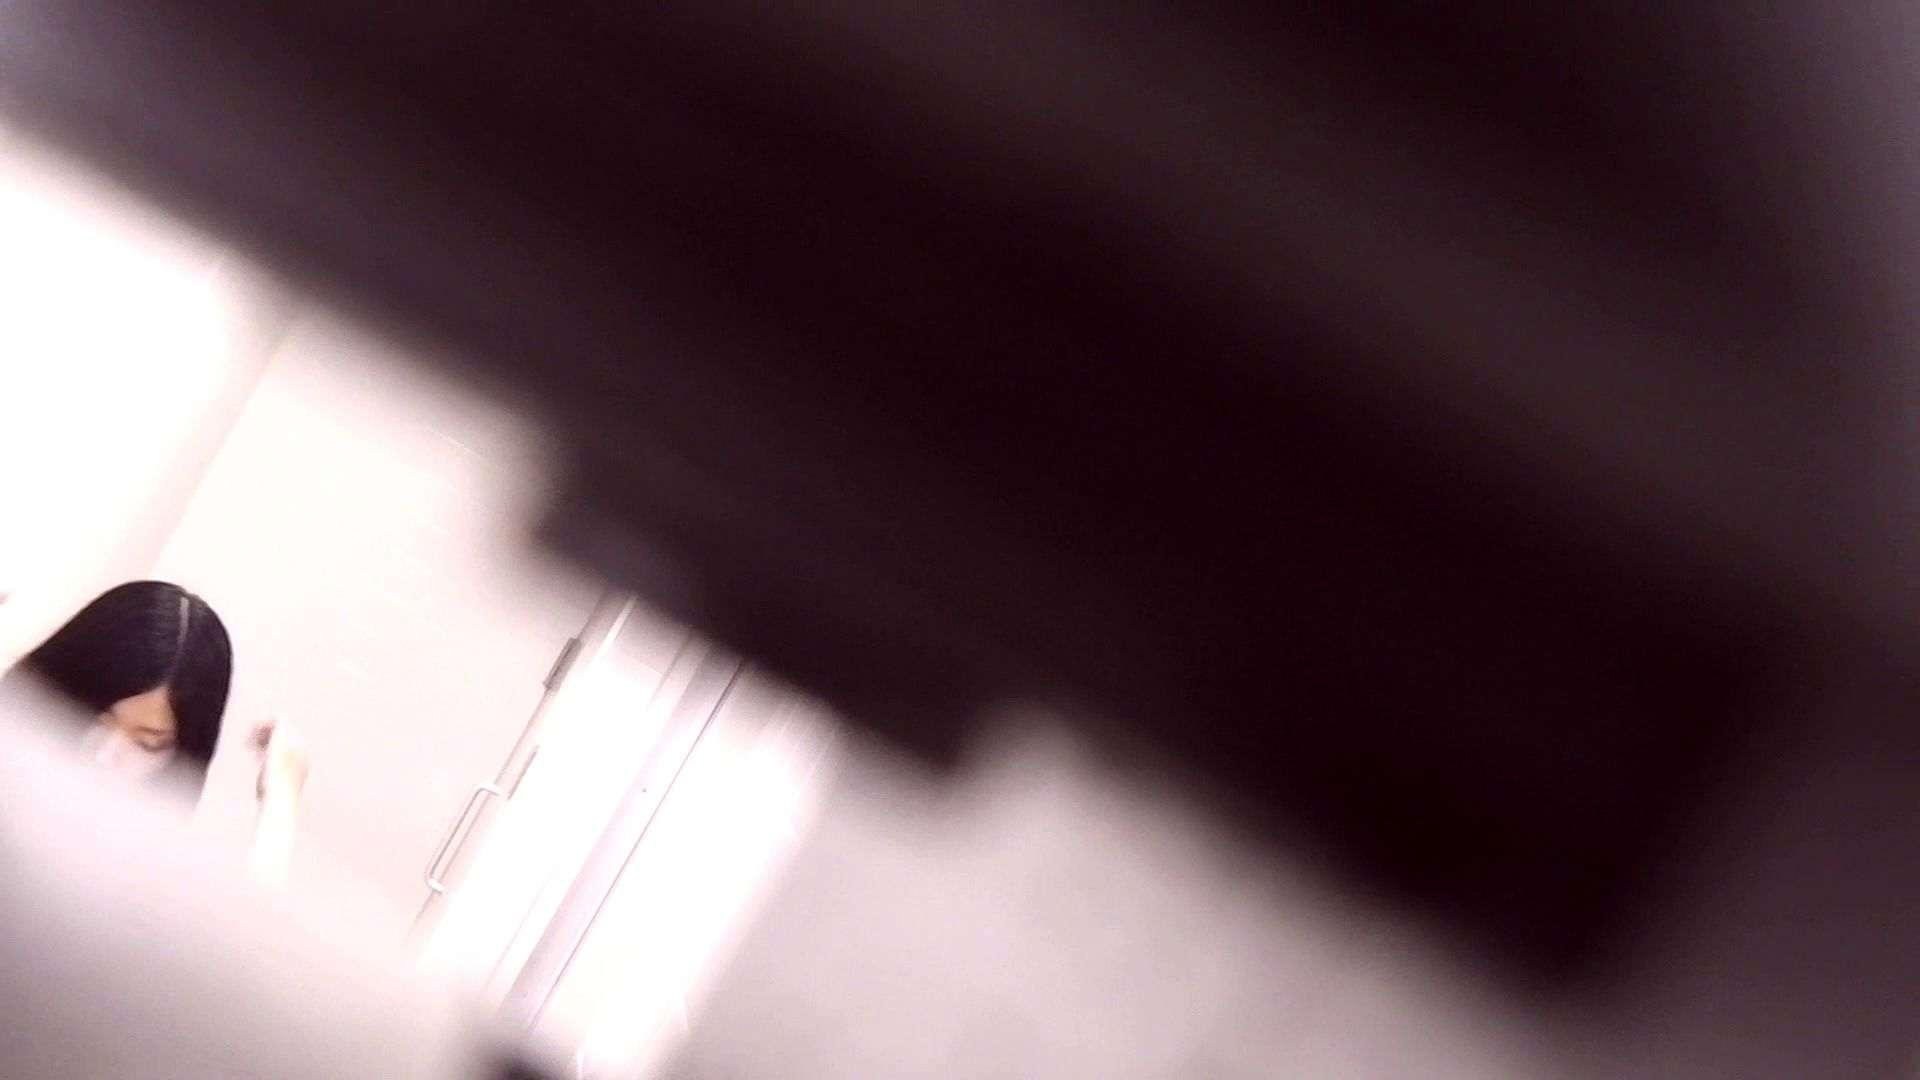 vol.16 命がけ潜伏洗面所! 美女たっぷり!! 独身エッチOL | 潜入プロ映像  28pic 20